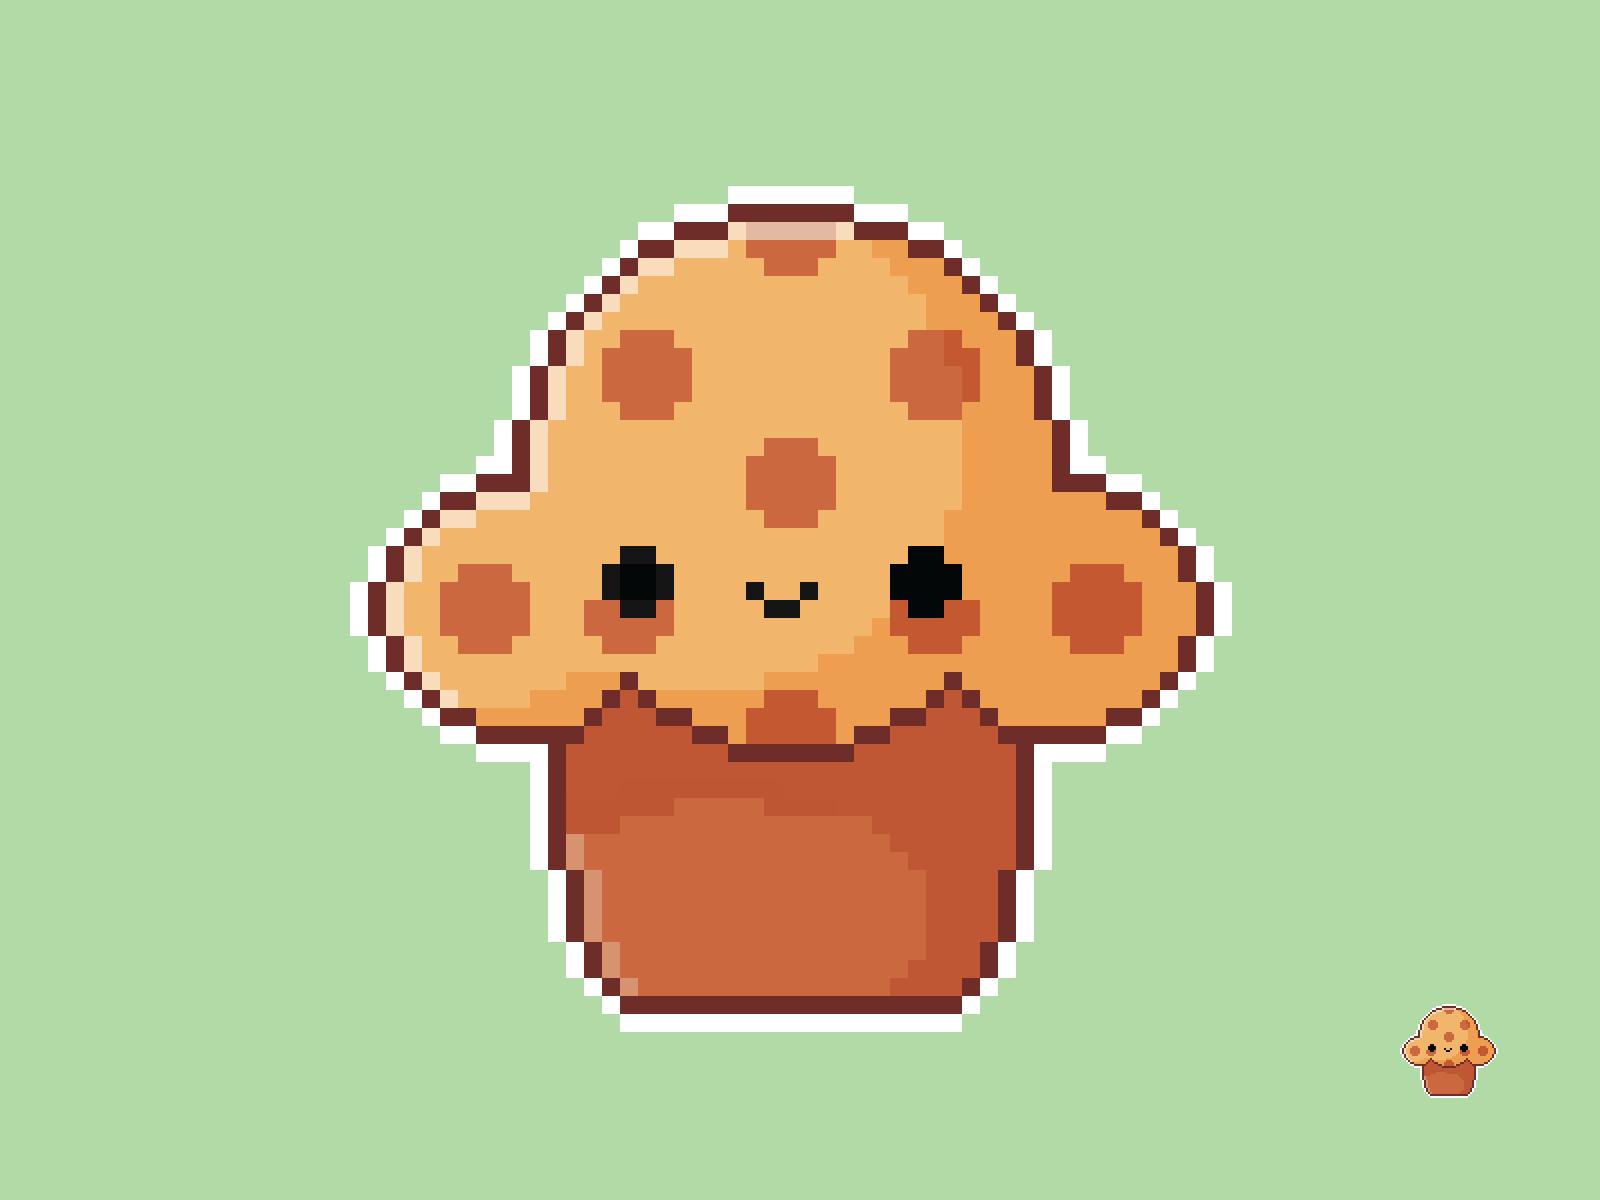 Cute Kawaii Muffin Pixel